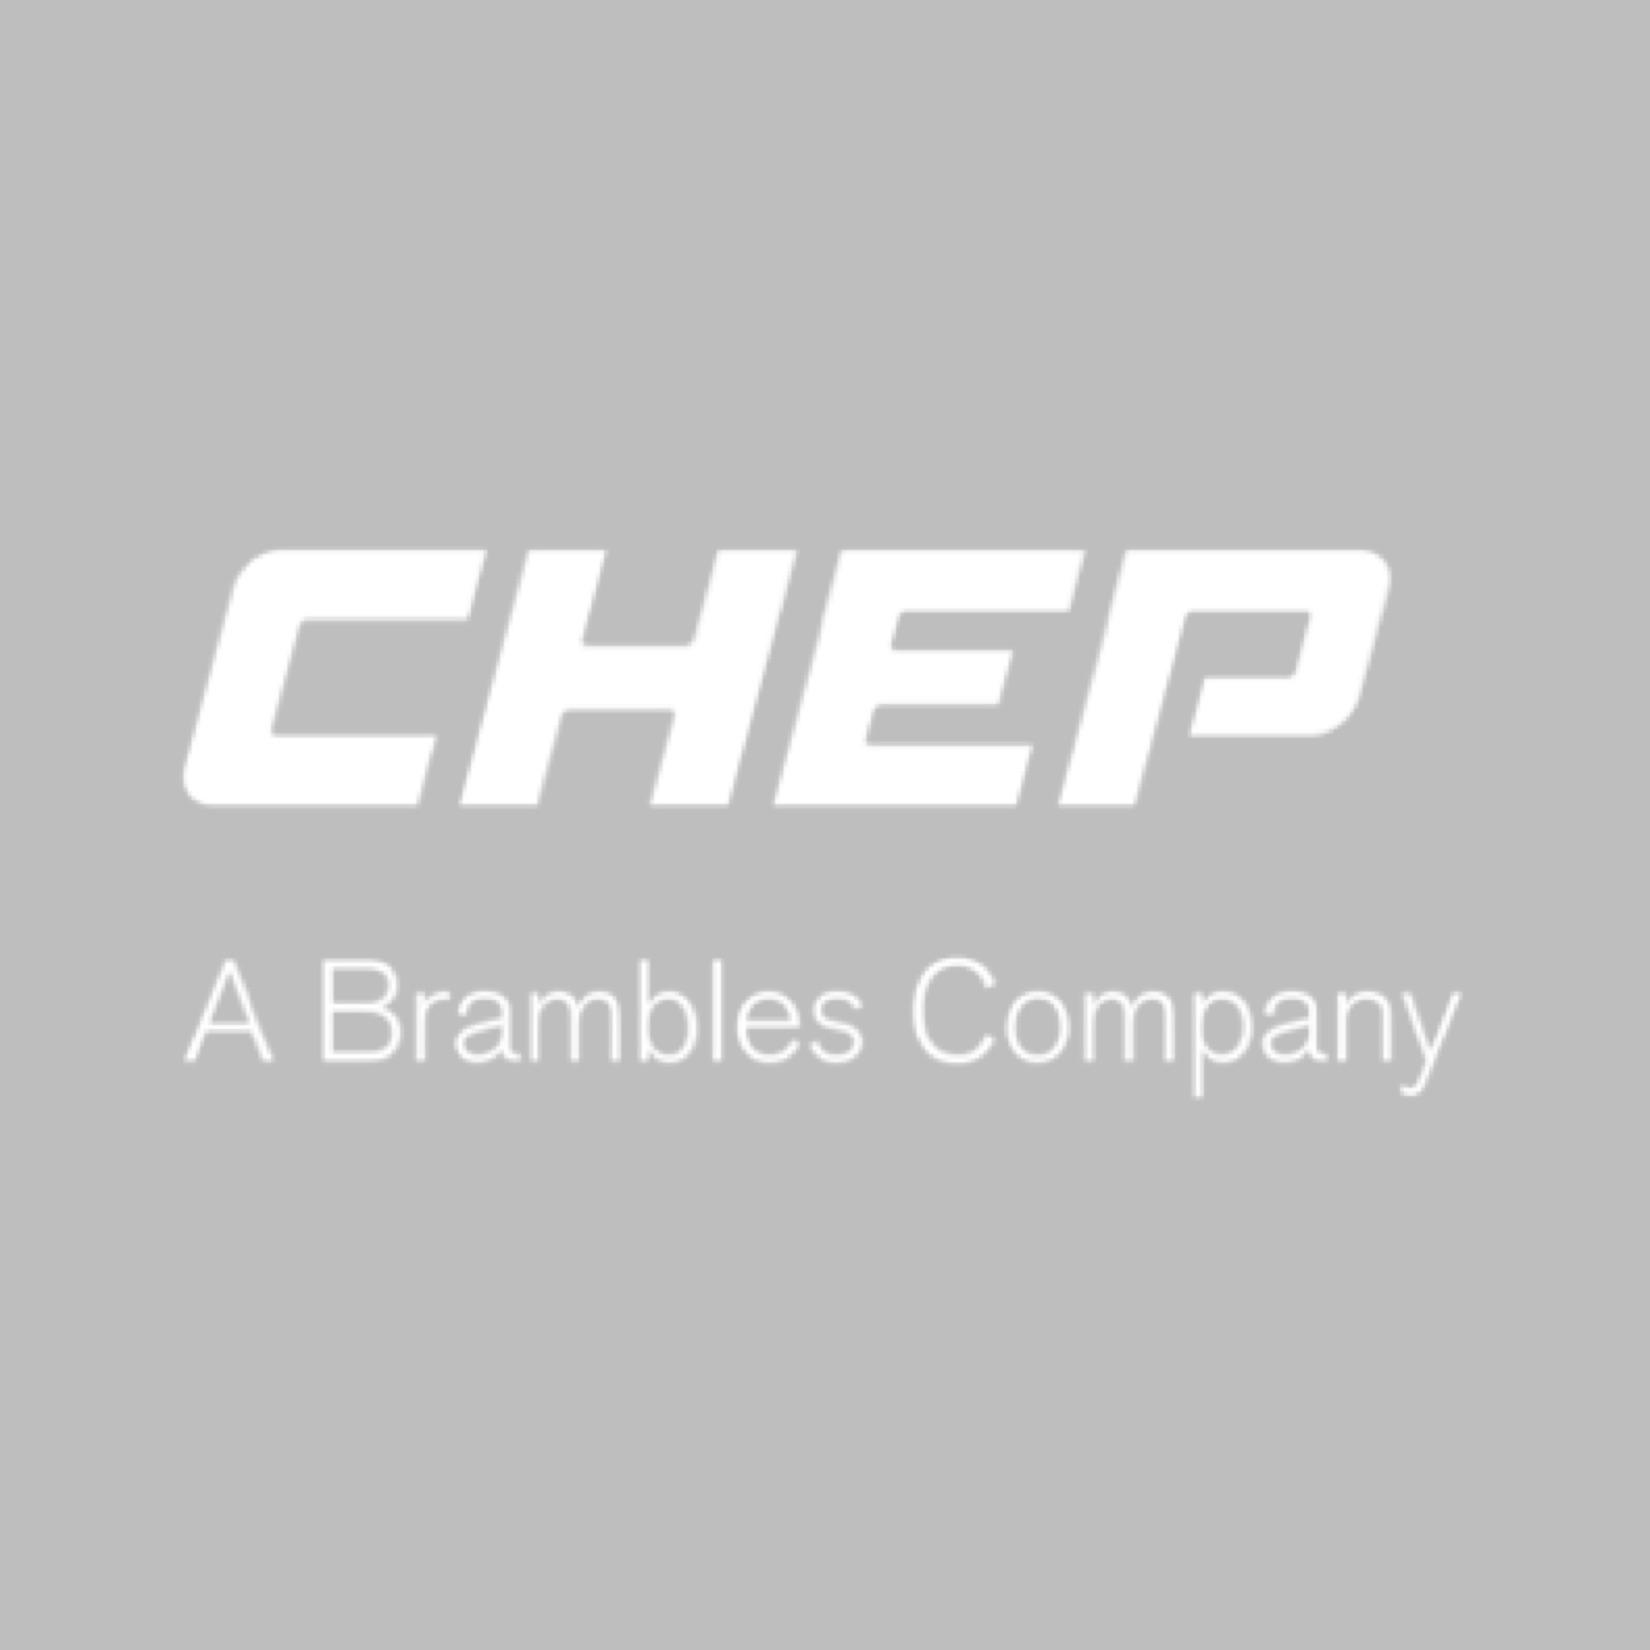 APG-CHEP.jpg